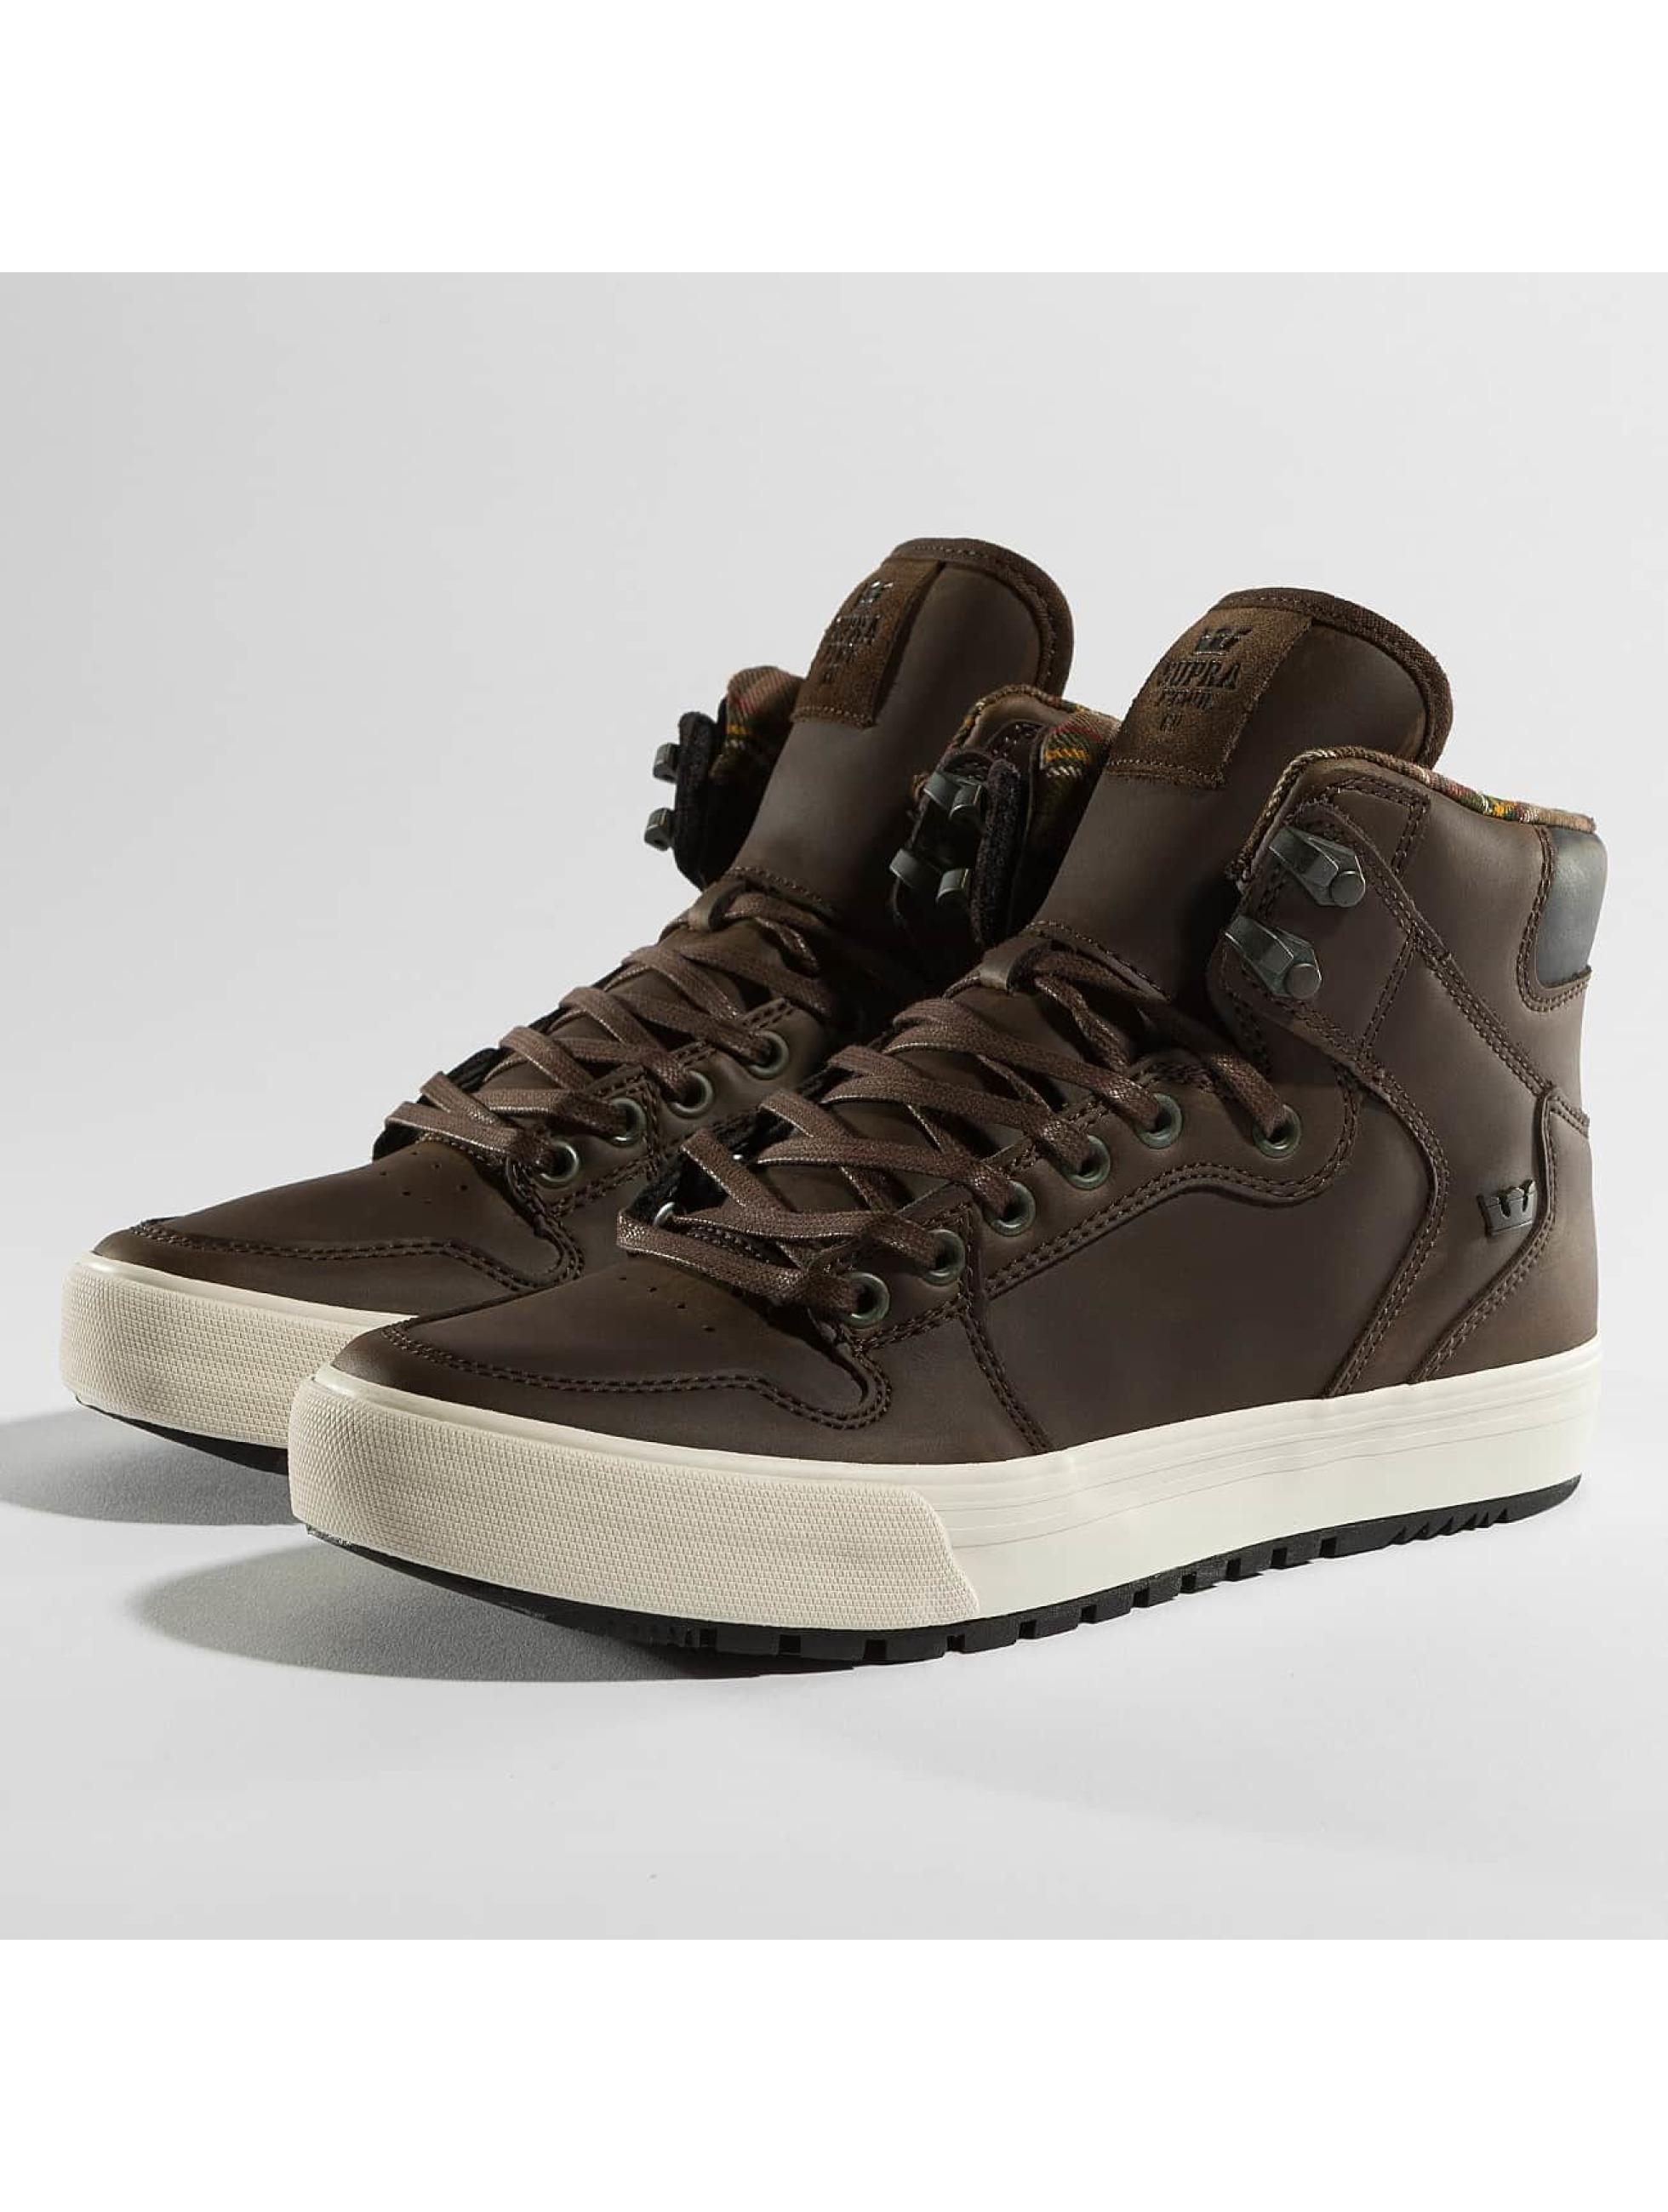 Pompes Desideria Rood Chaussures Evita Yg9S58qJol